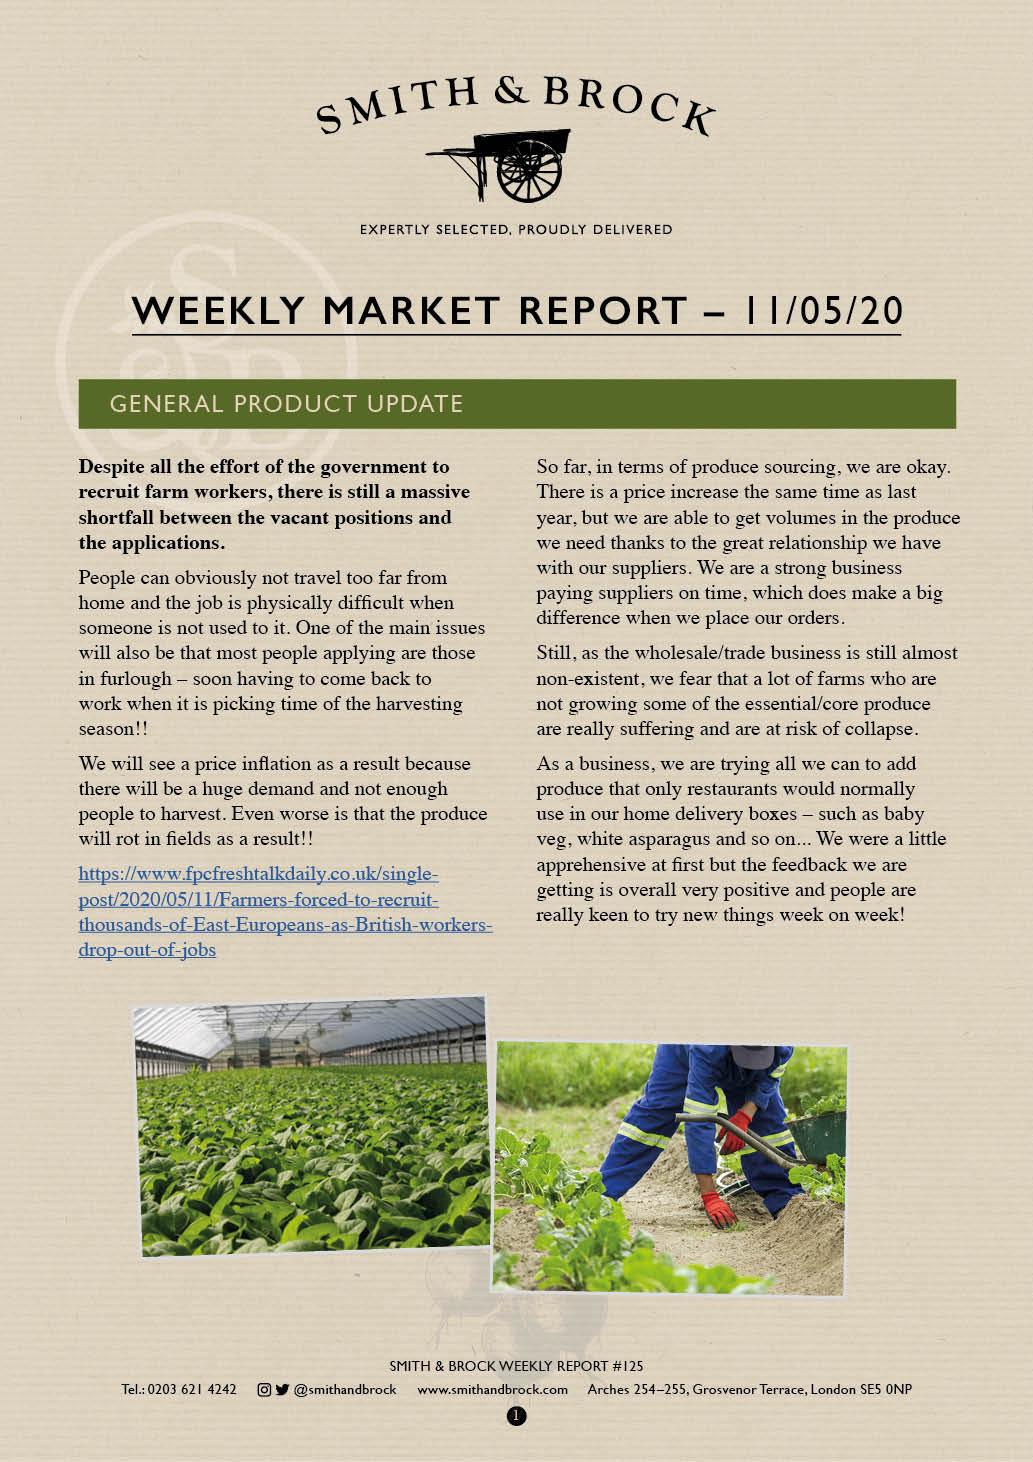 Smith&Brock Market Report 11 may 2020 125